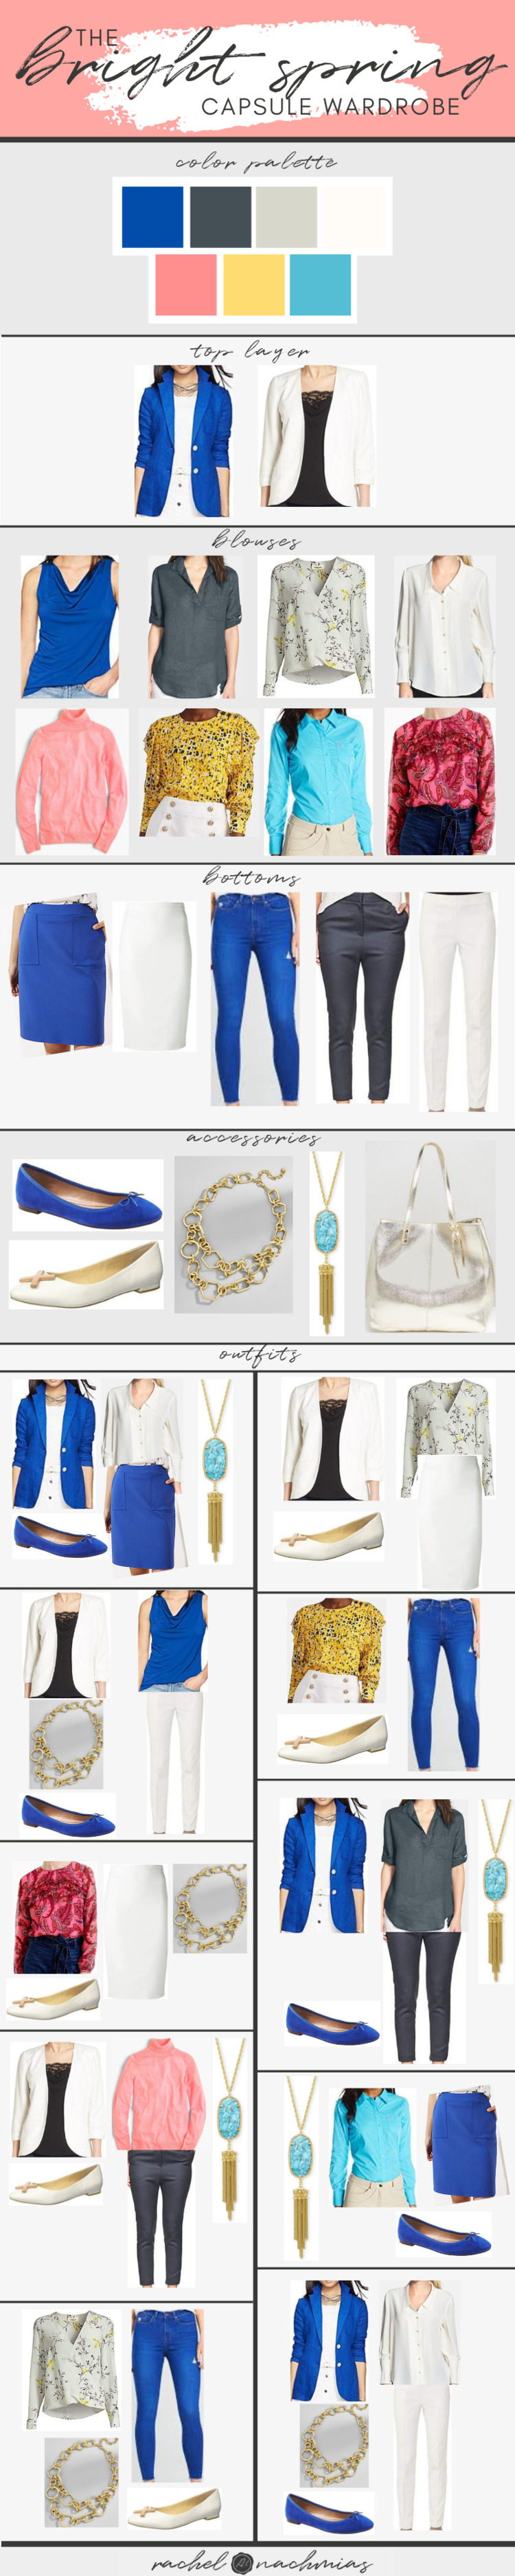 A Professional Capsule Wardrobe: Bright Spring — Philadelphia's Image Consultant   Best Dressed